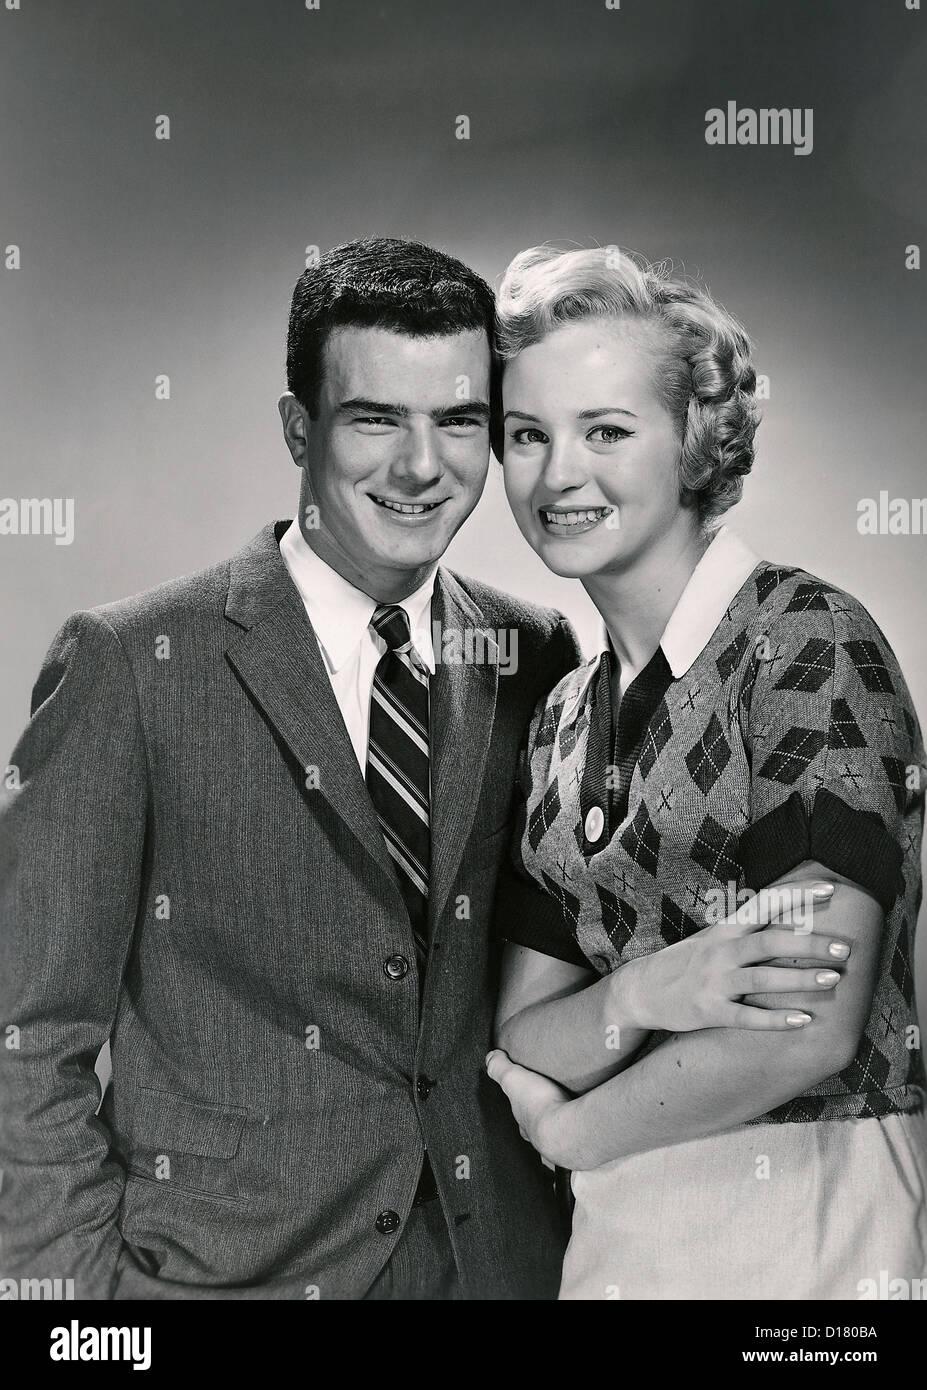 Vintage portrait of smiling couple Photo Stock